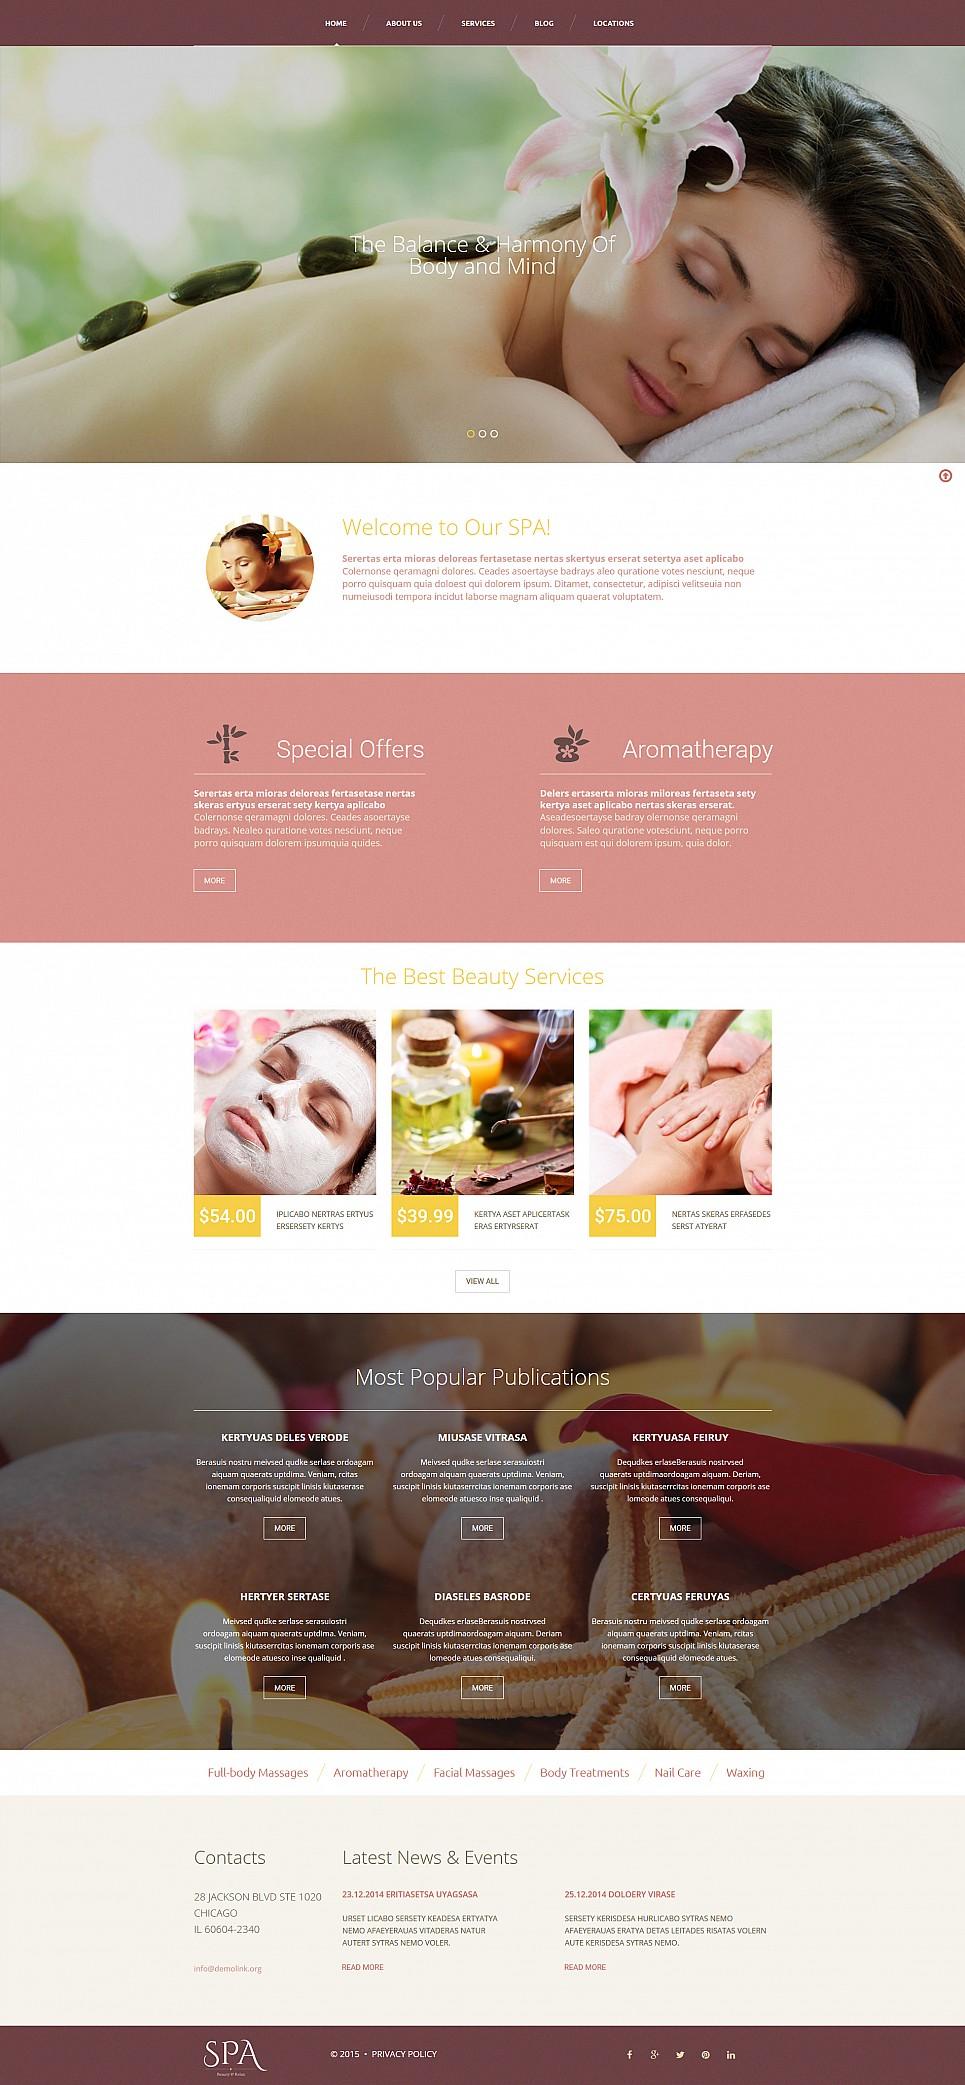 Responsive Design for Spa Salon Website - image